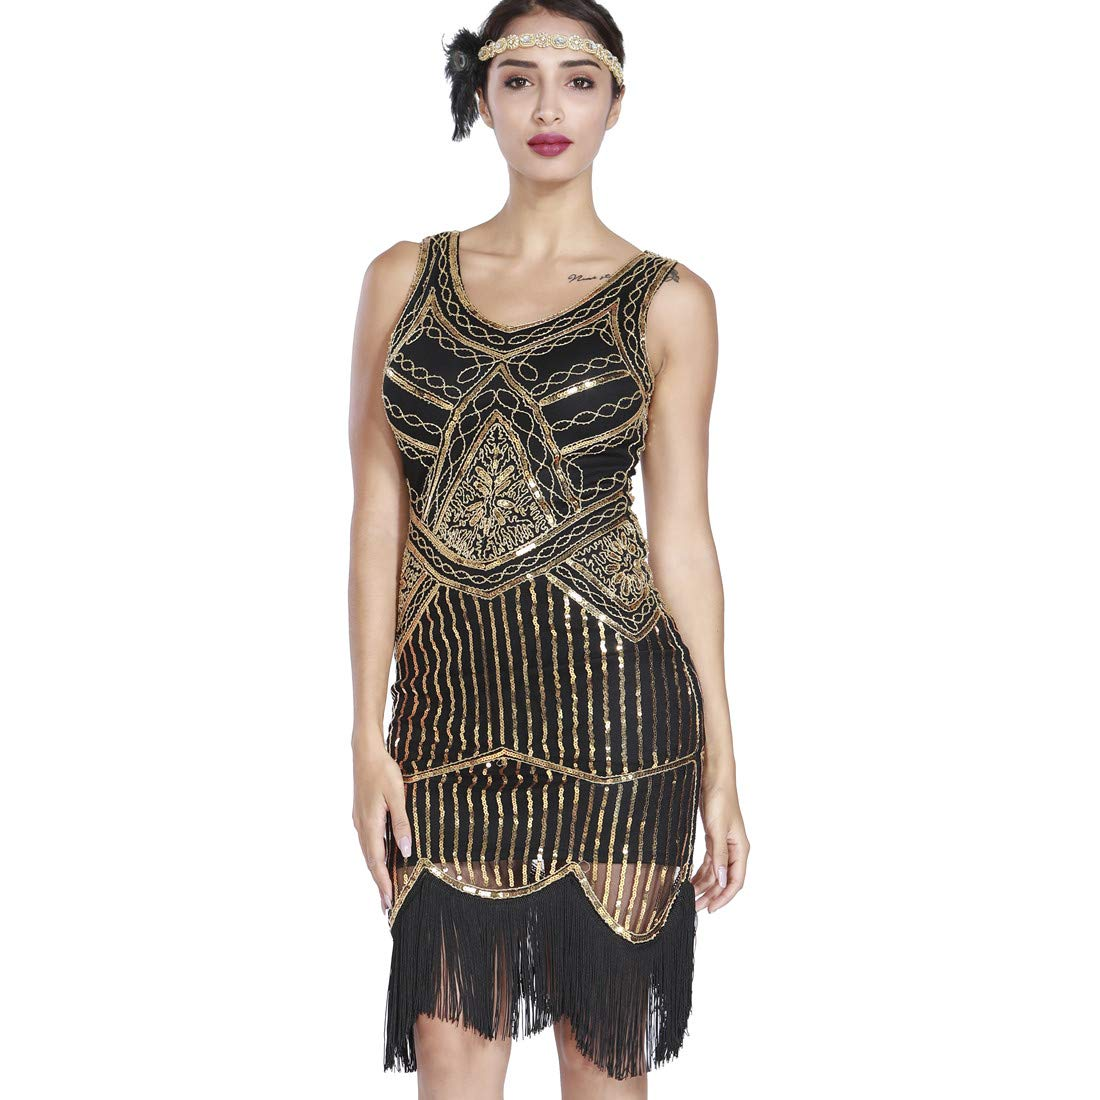 7e6b20e69cd Amazon.com  MAYEVER 1920s Flapper Dress Roaring 20s Great Gatsby Costume  Dress Fringed Sequin  Clothing